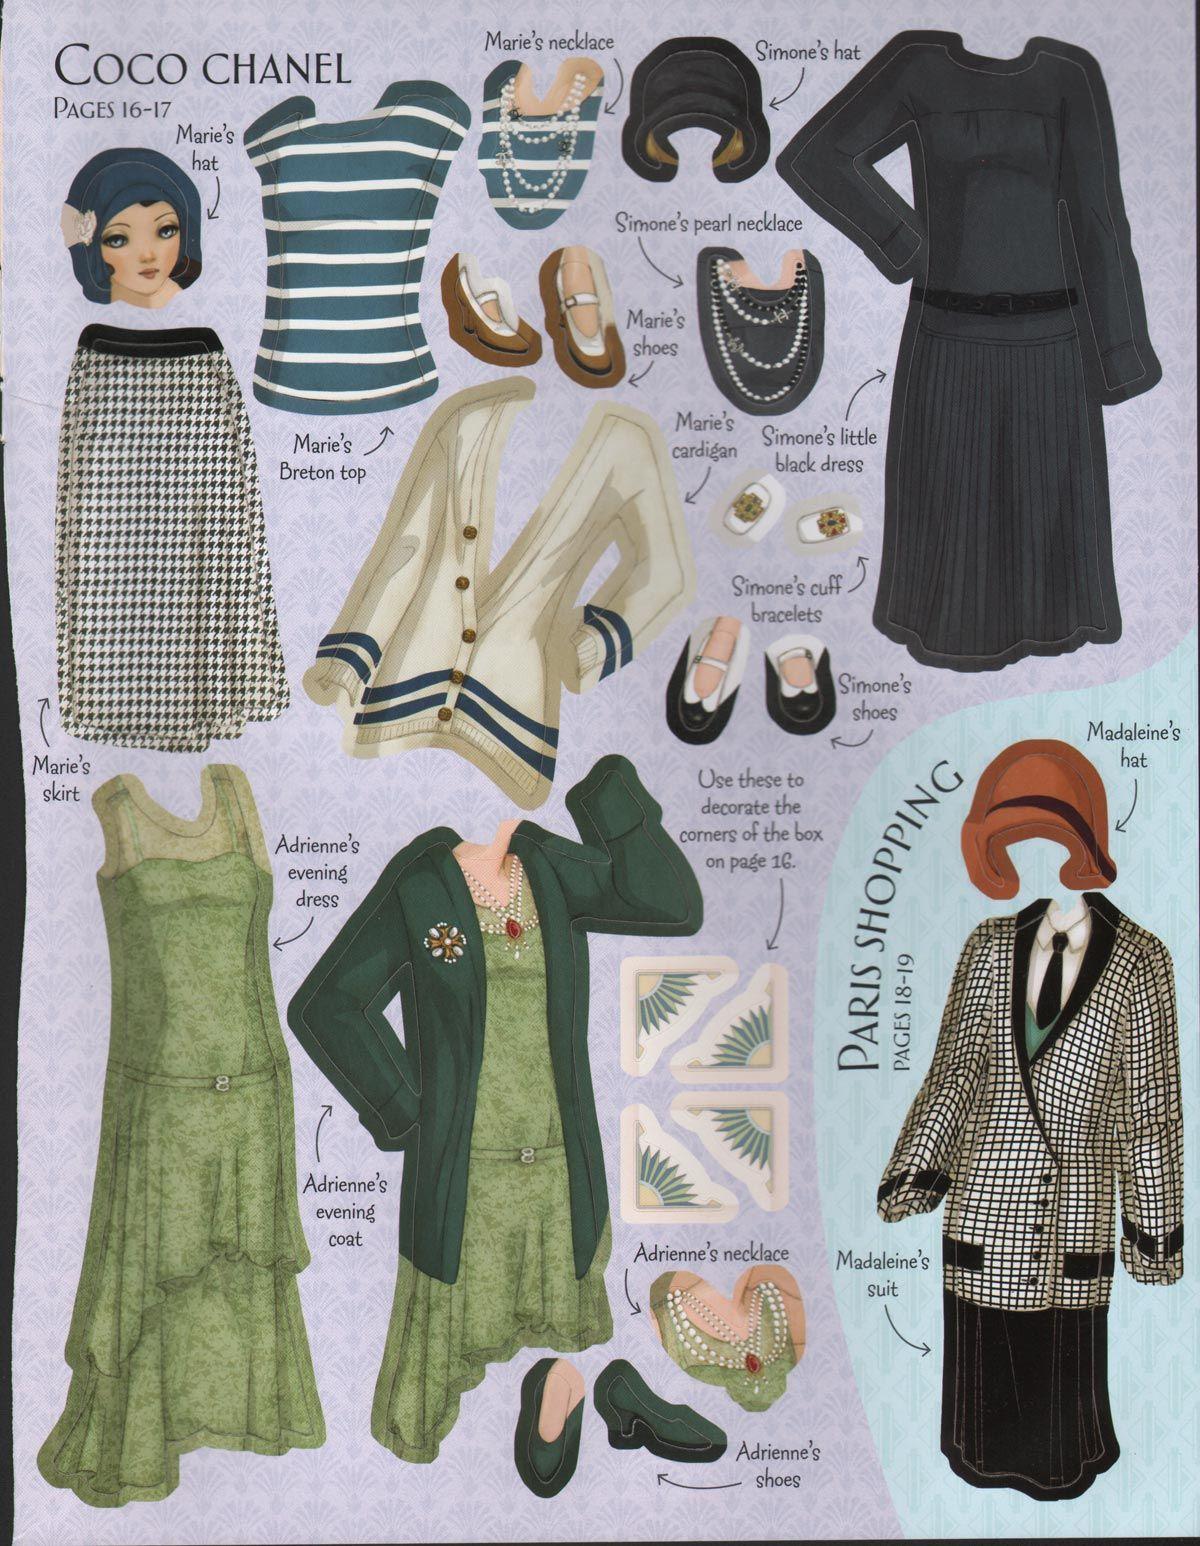 A Coco Chanel Wardrobe. http://glamourdaze.com/2014/02/1920s-fashion-animation.html